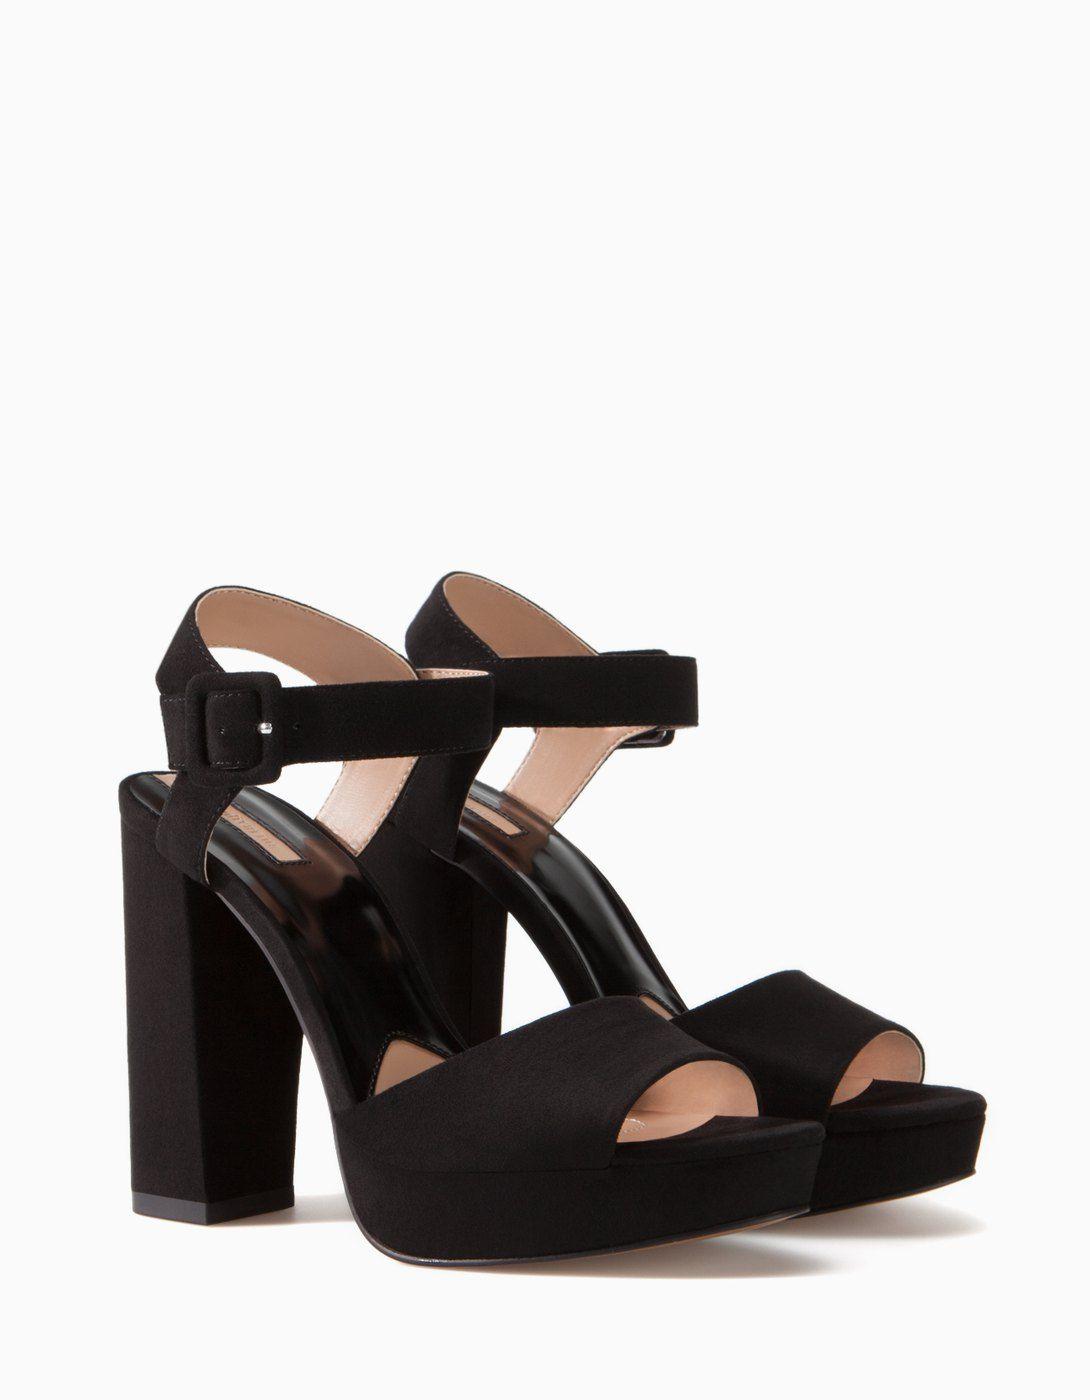 Sandalia MujerStradivarius Tacón Plataforma De Zapatos 0Ow8nPXk